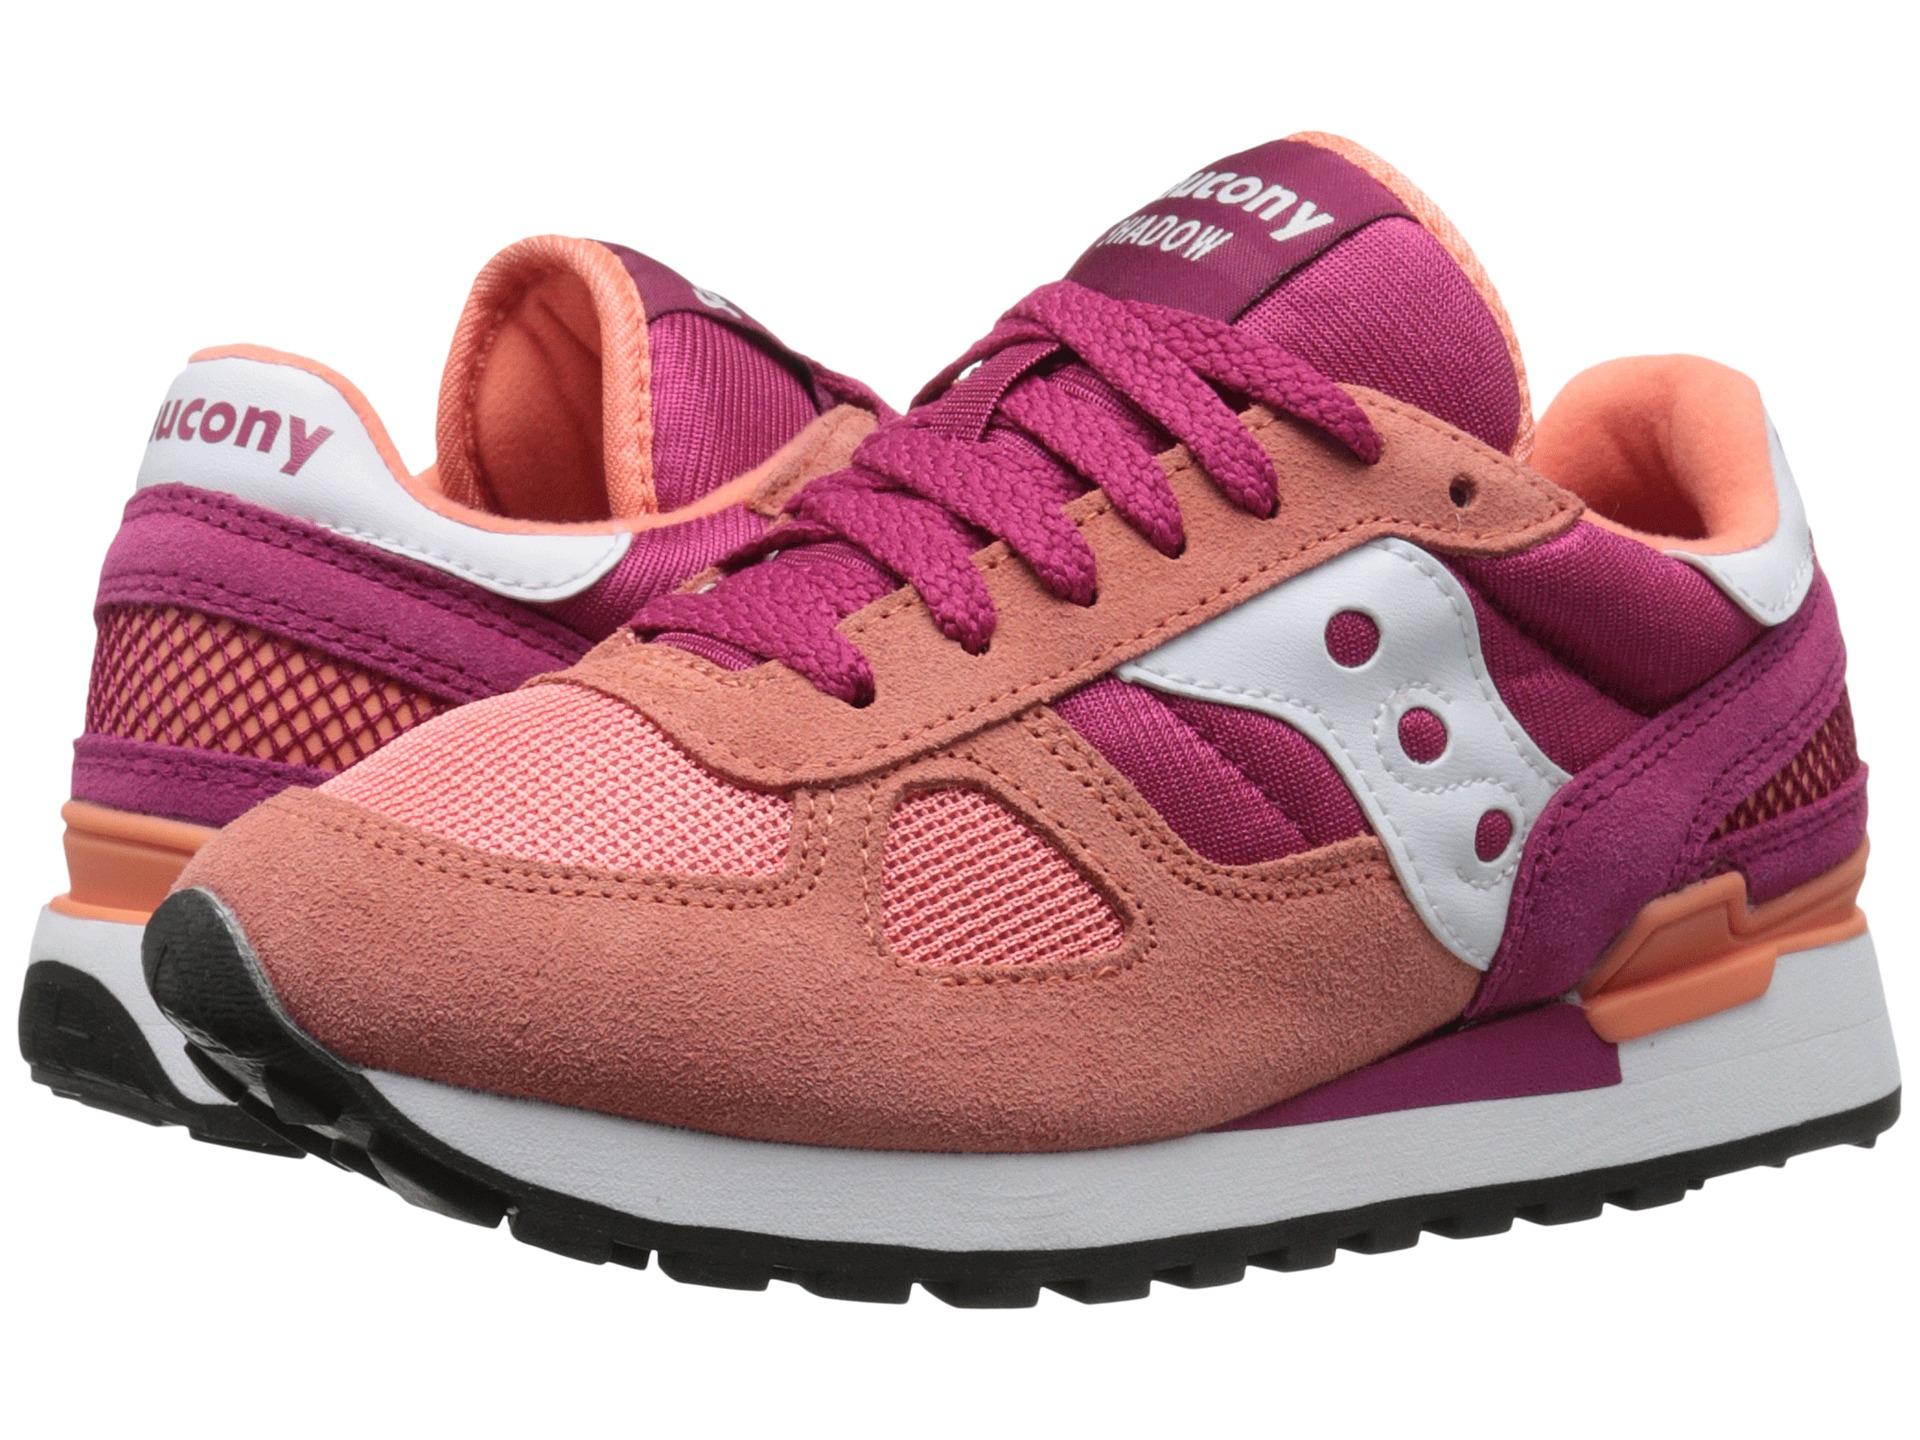 Womens Shoes Saucony Originals Shadow Original - Sushi Pack Pink/Red